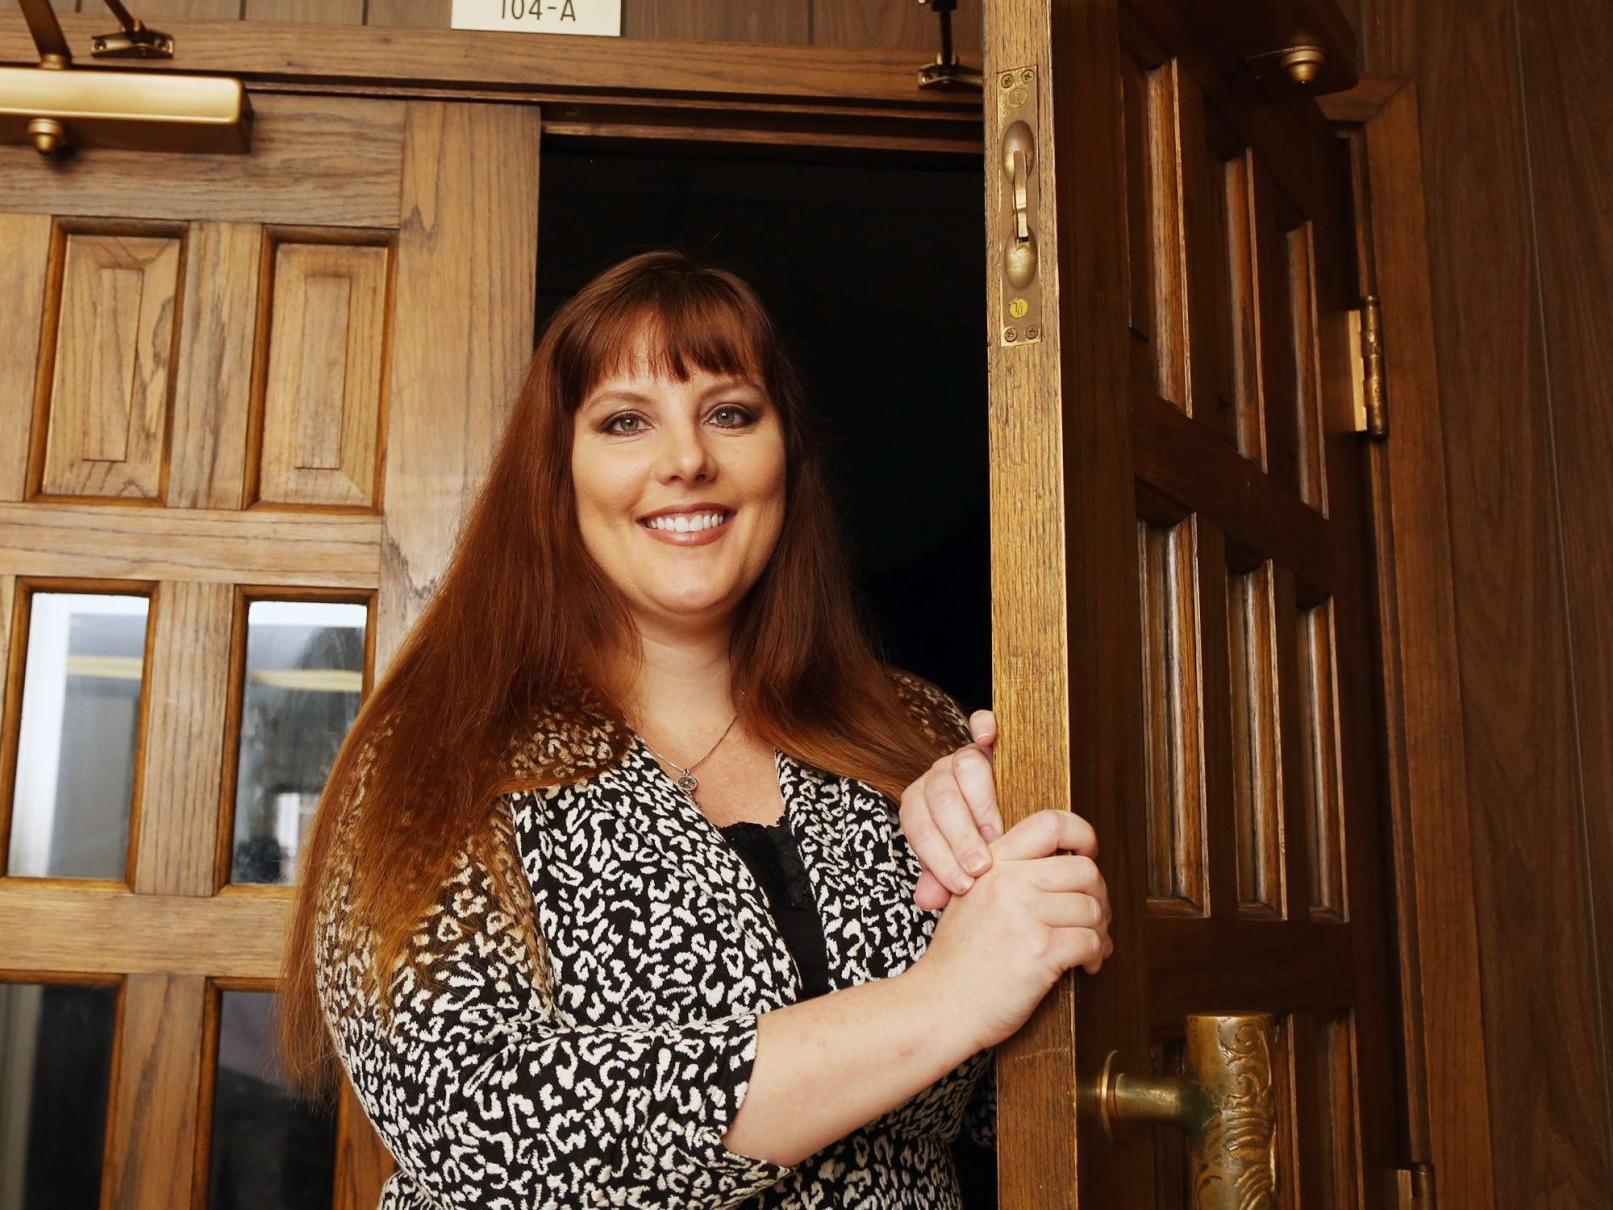 Ex-JP DeCluitt leaves county job for city of Waco | Crime | wacotrib.com